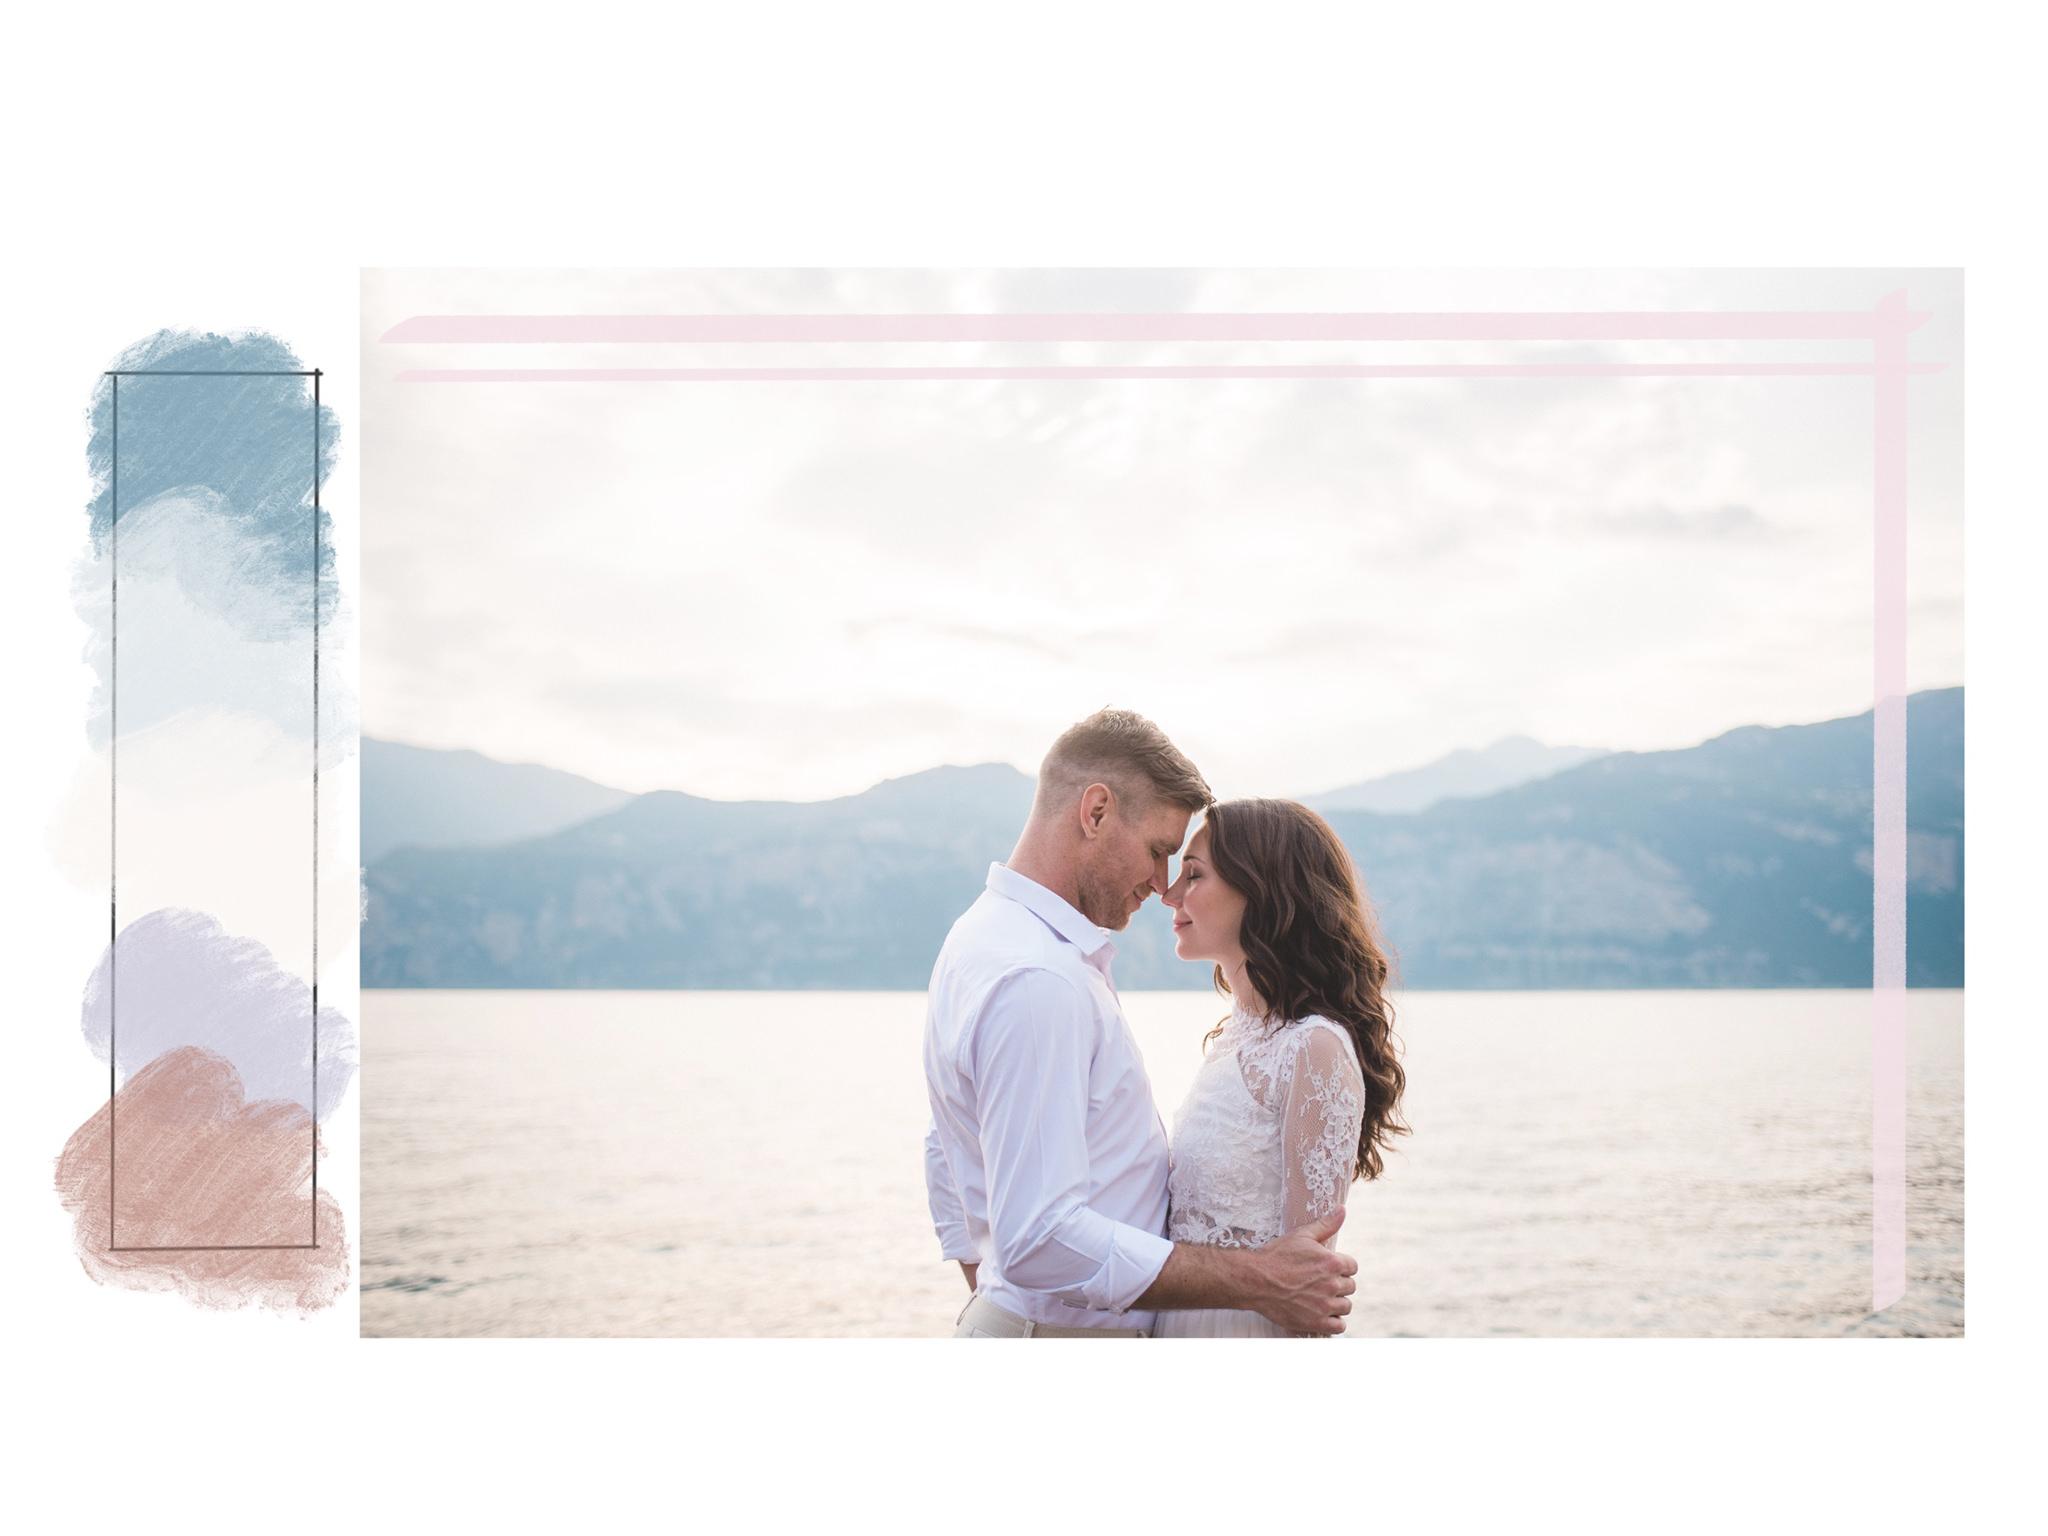 Wedding Photo & Video Lake Garda